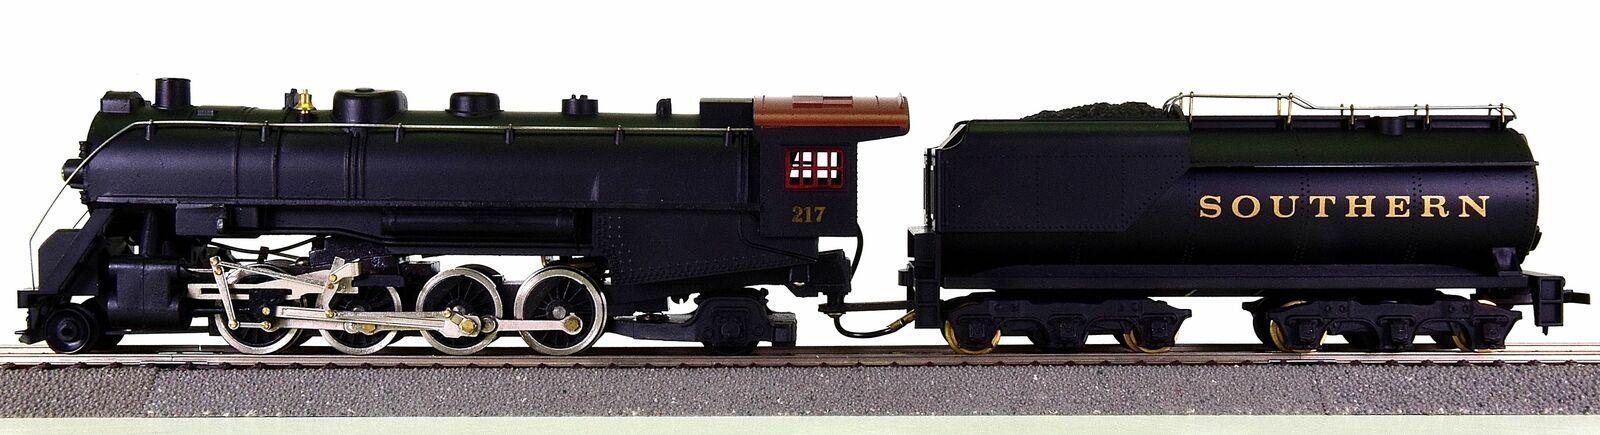 Mantua 332-40 - schlepptender-máquina de vapor 2-8-2 el Mikado Southern